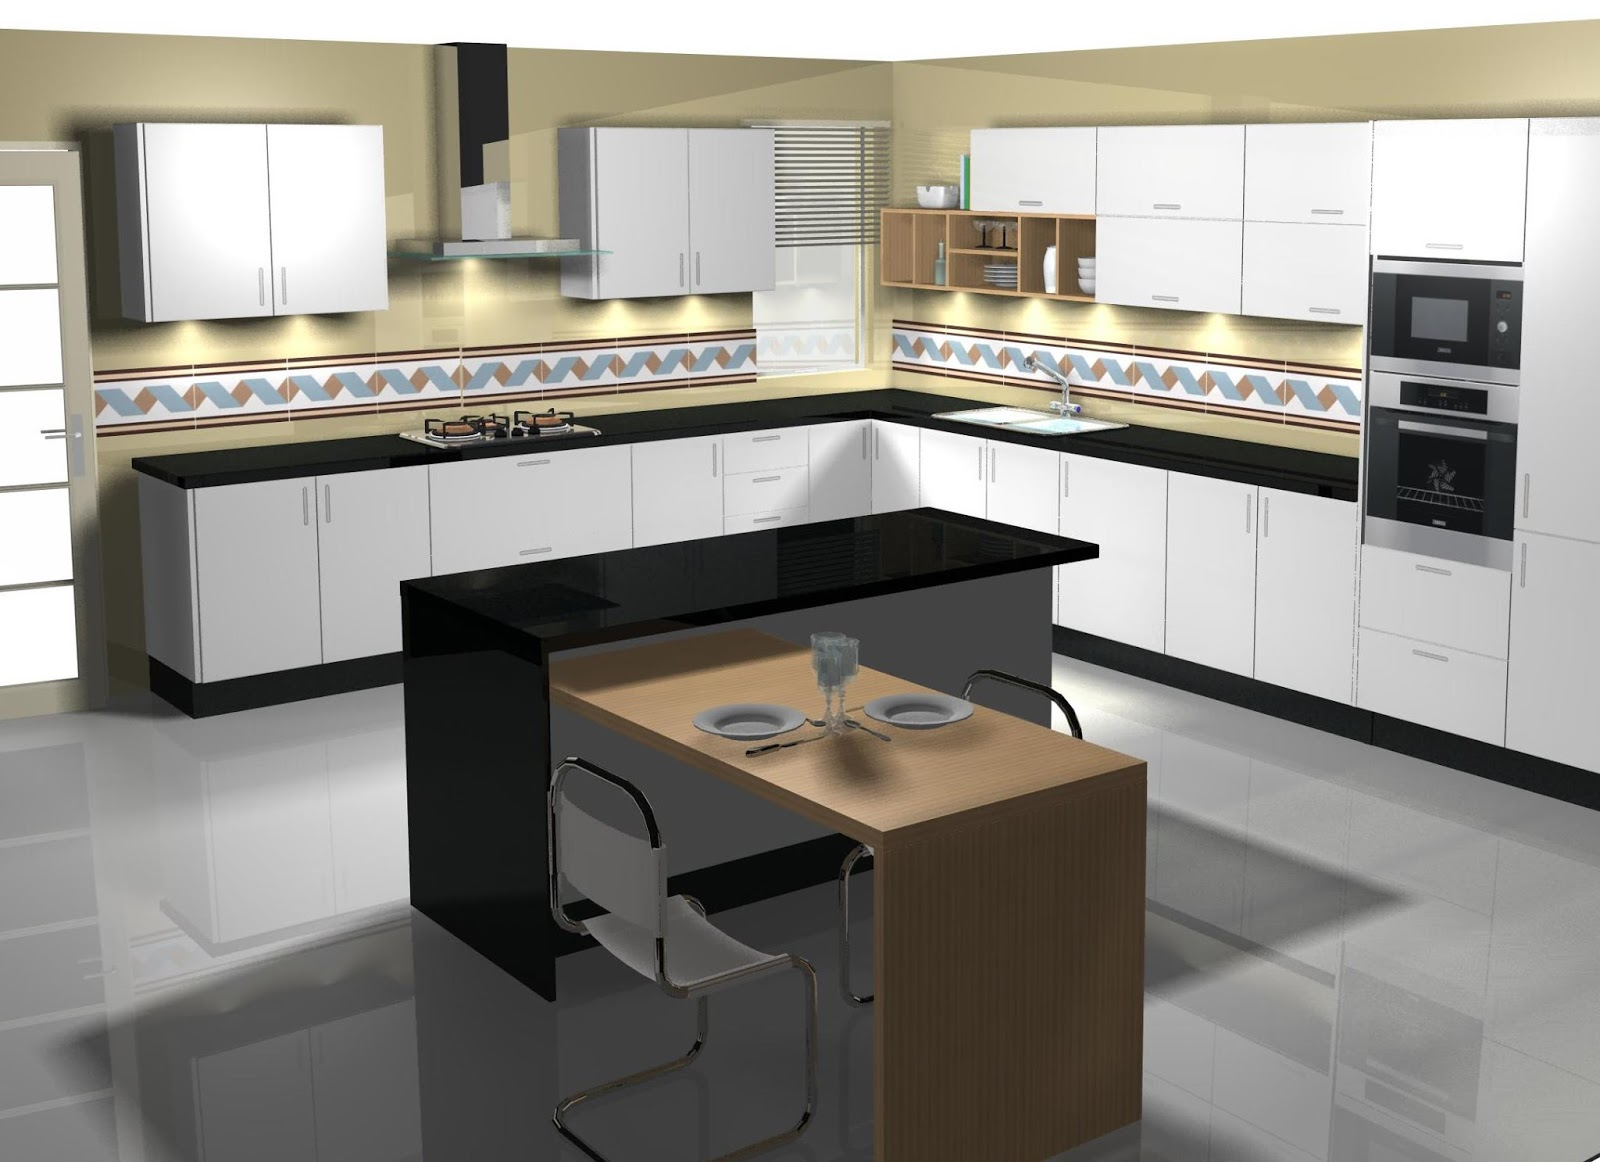 Dise o de cocina con isla y mesa - Mesa extraible cocina ...